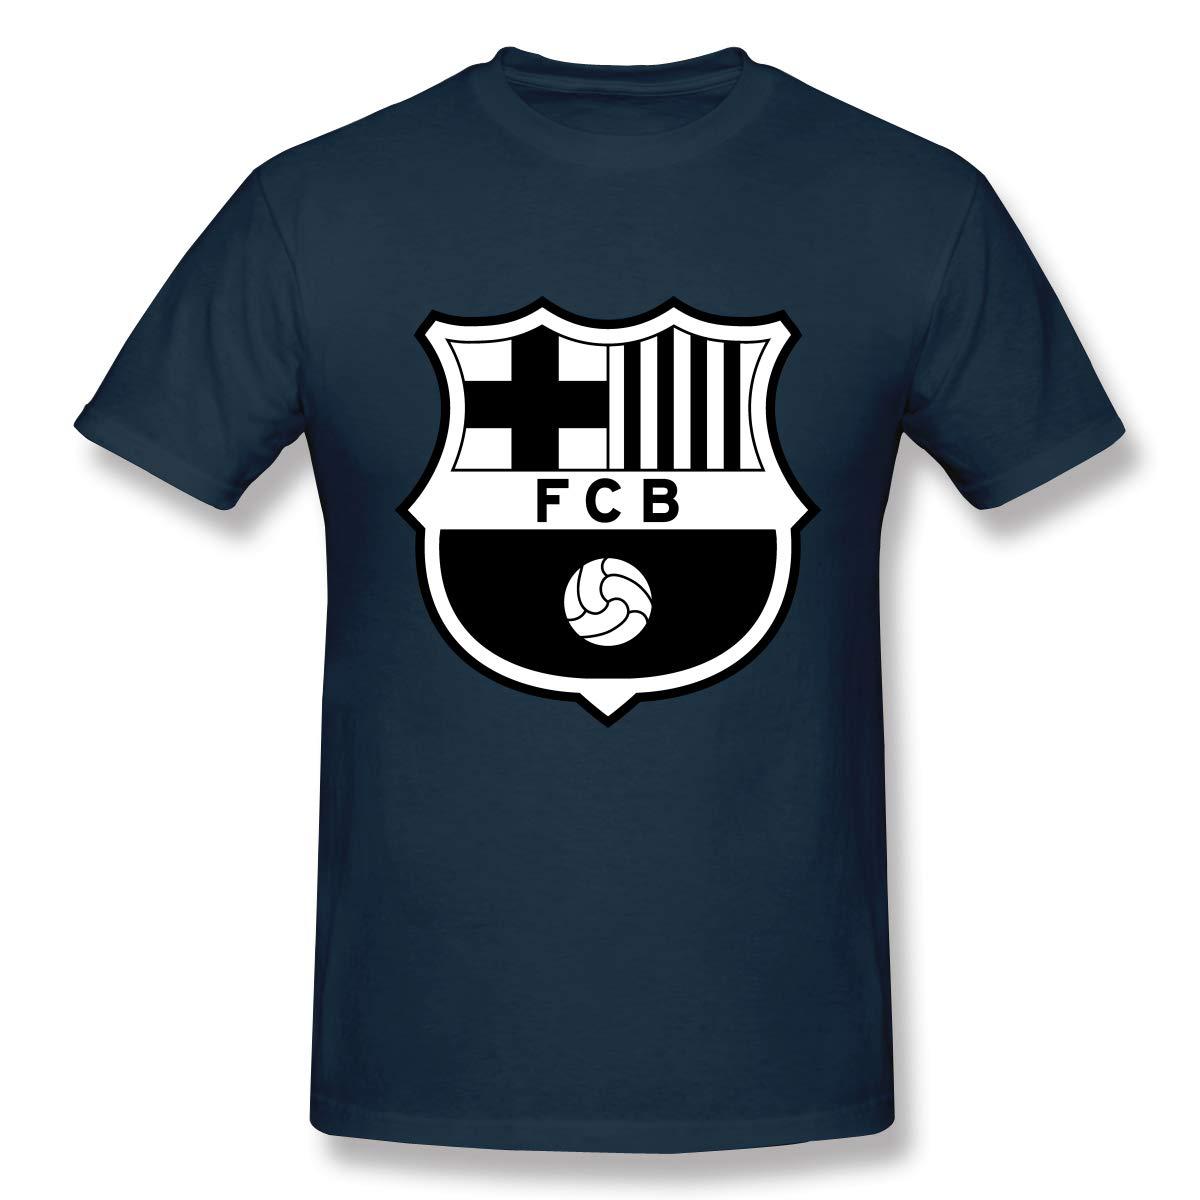 DAZHL FC Barcelona Logo Casual Men's Cotton Tee Short Sleeve T-Shirt Navy S